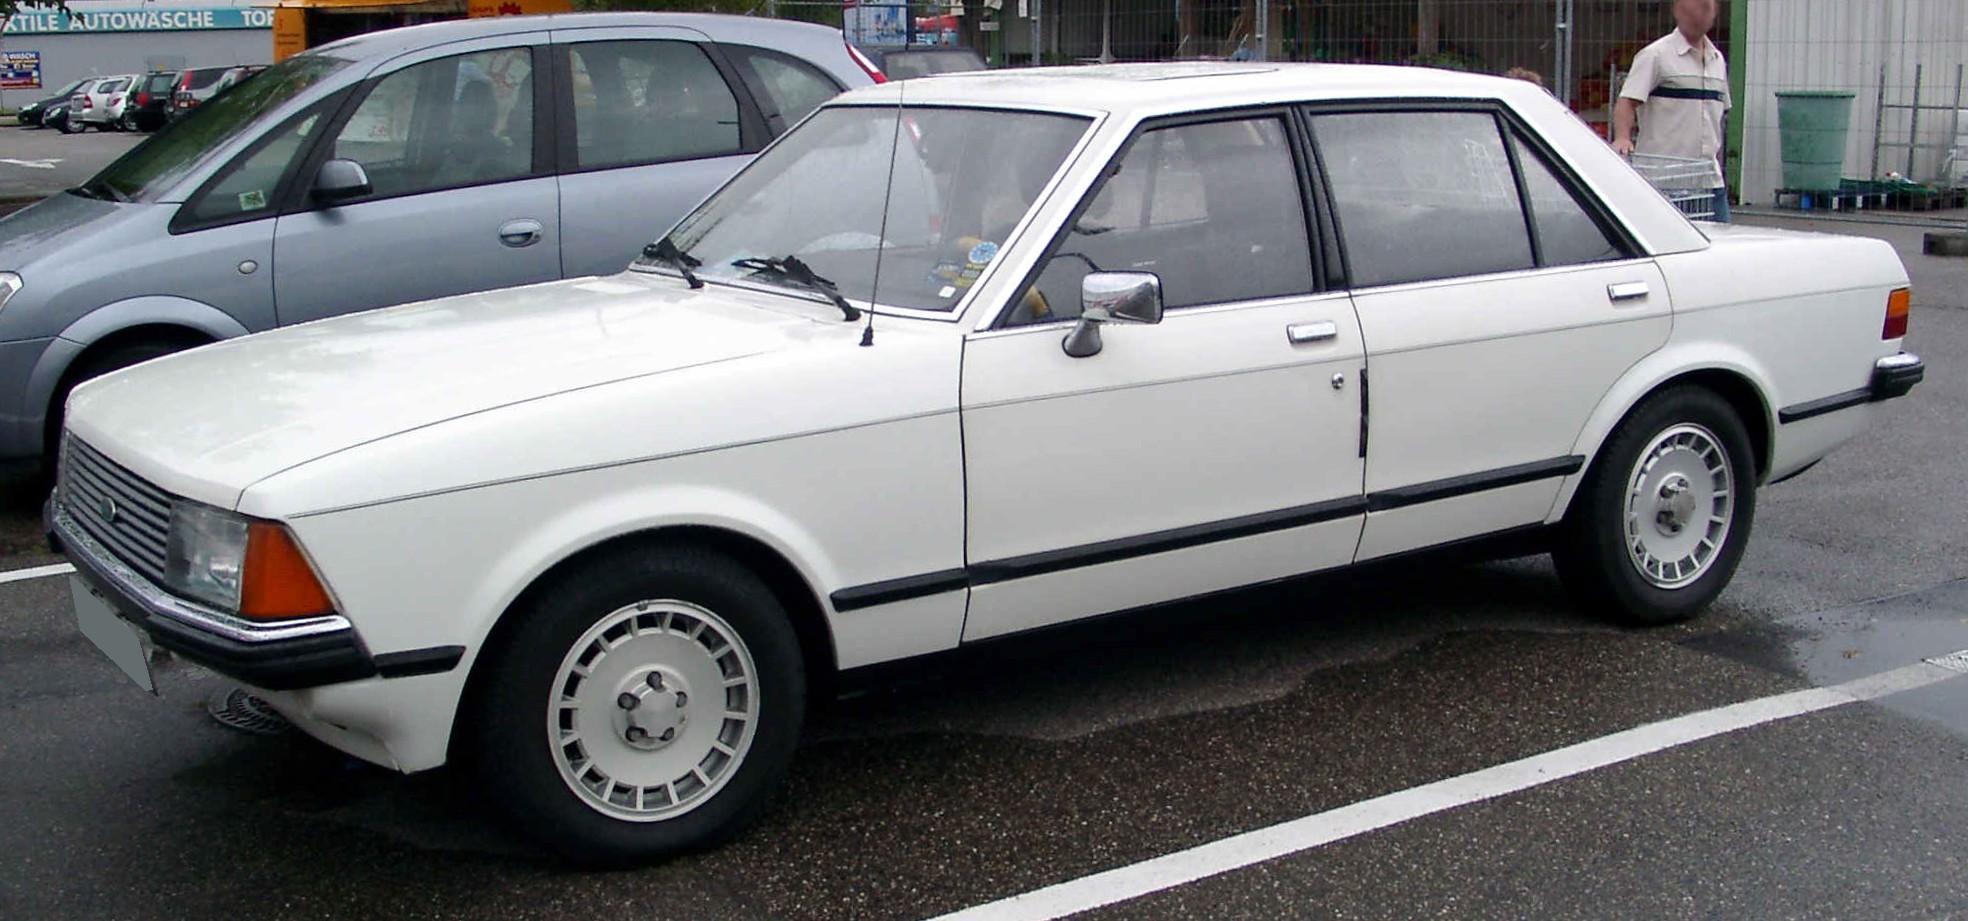 Image result for Ford Granada